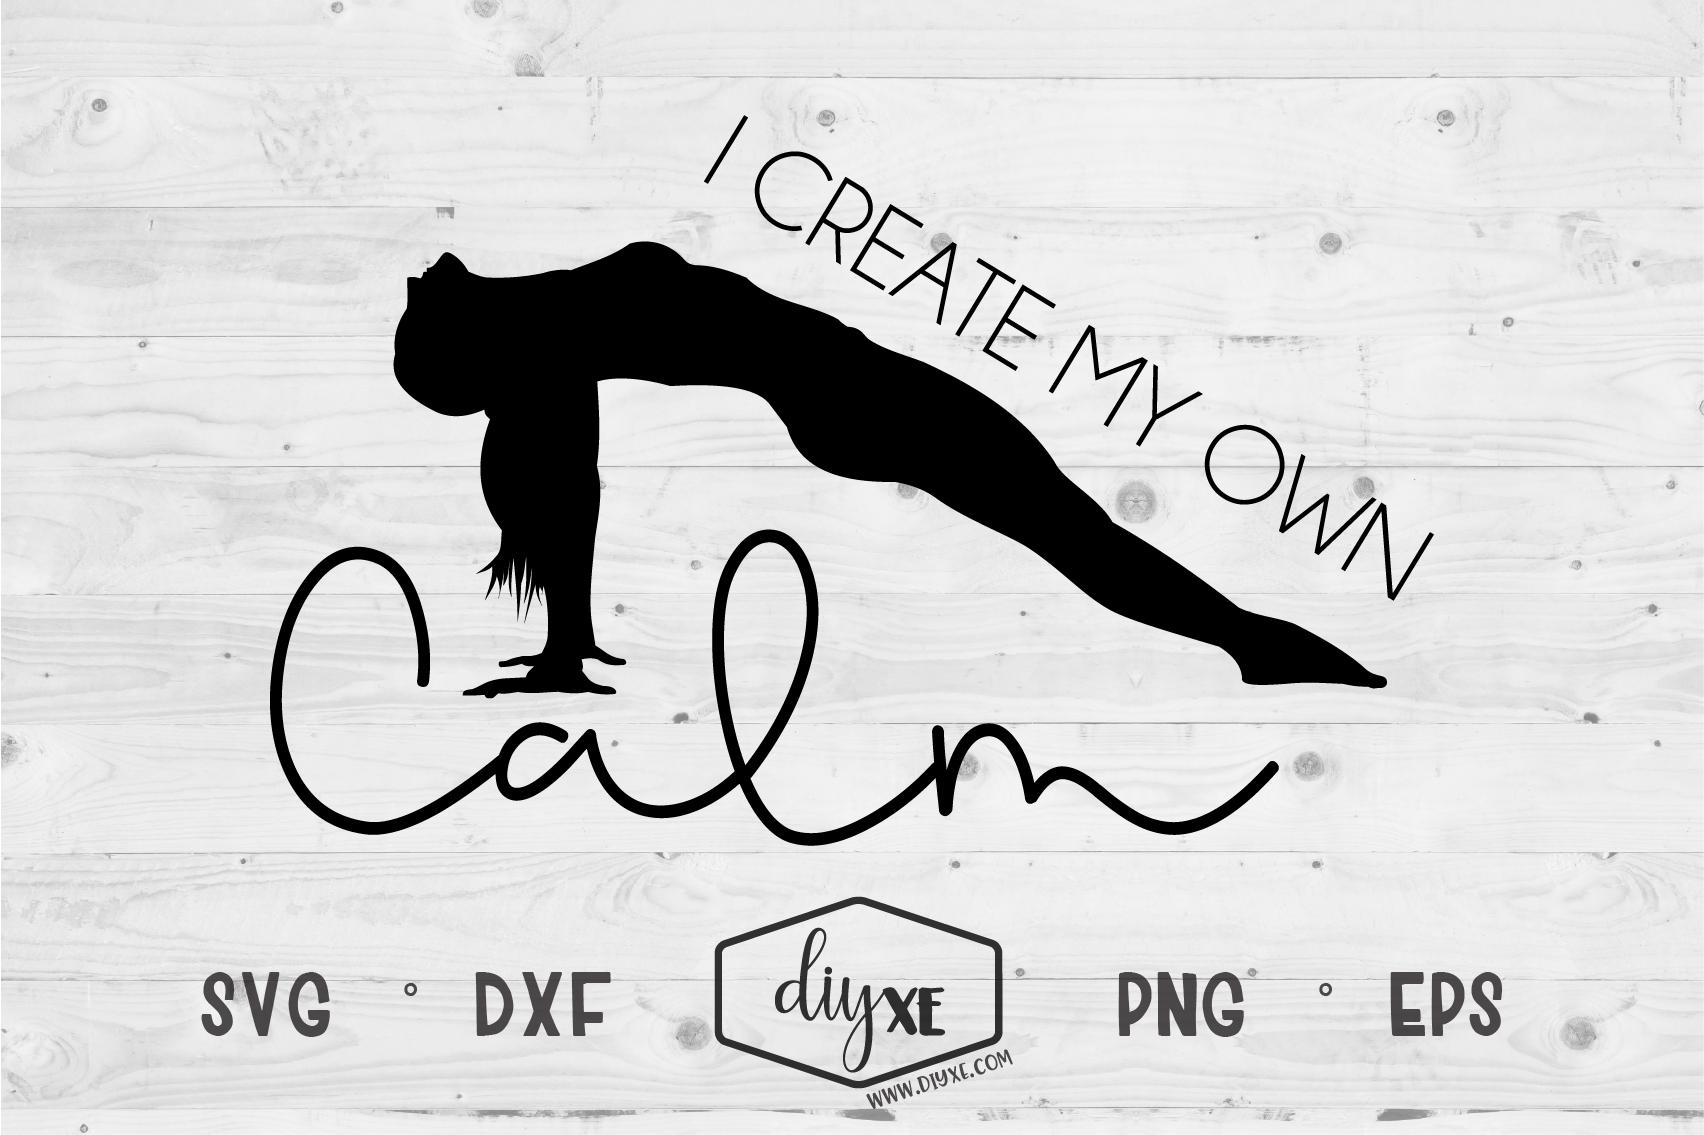 I Create My Own Calm - A Yoga SVG Cut File example image 2